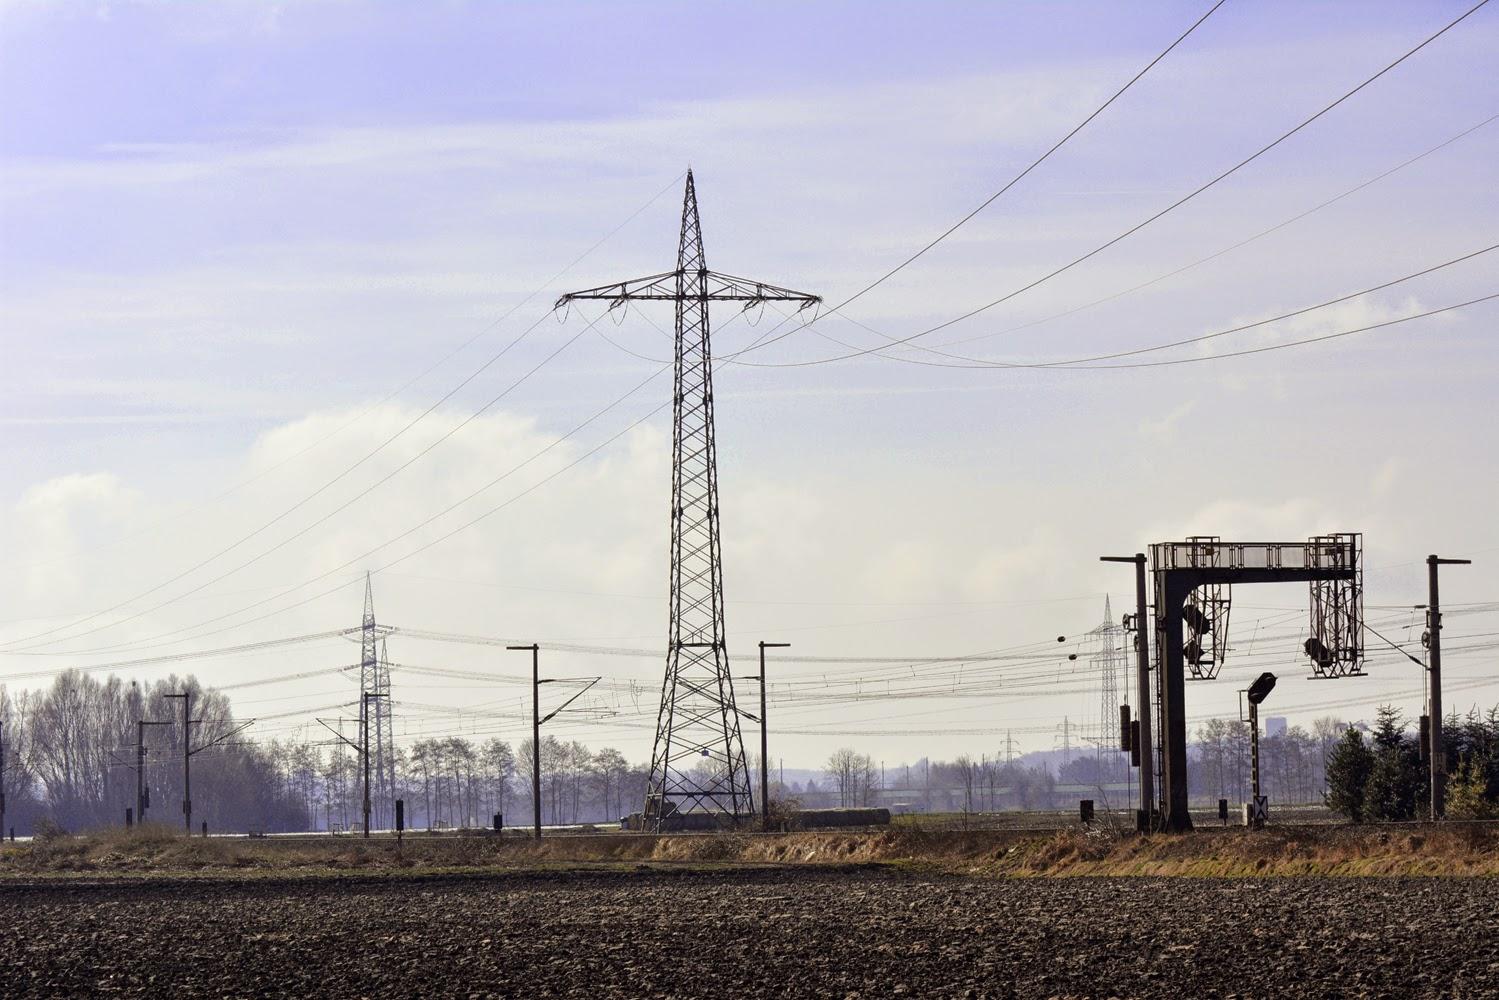 [Fotografie] Stadt, Land, Osterhase